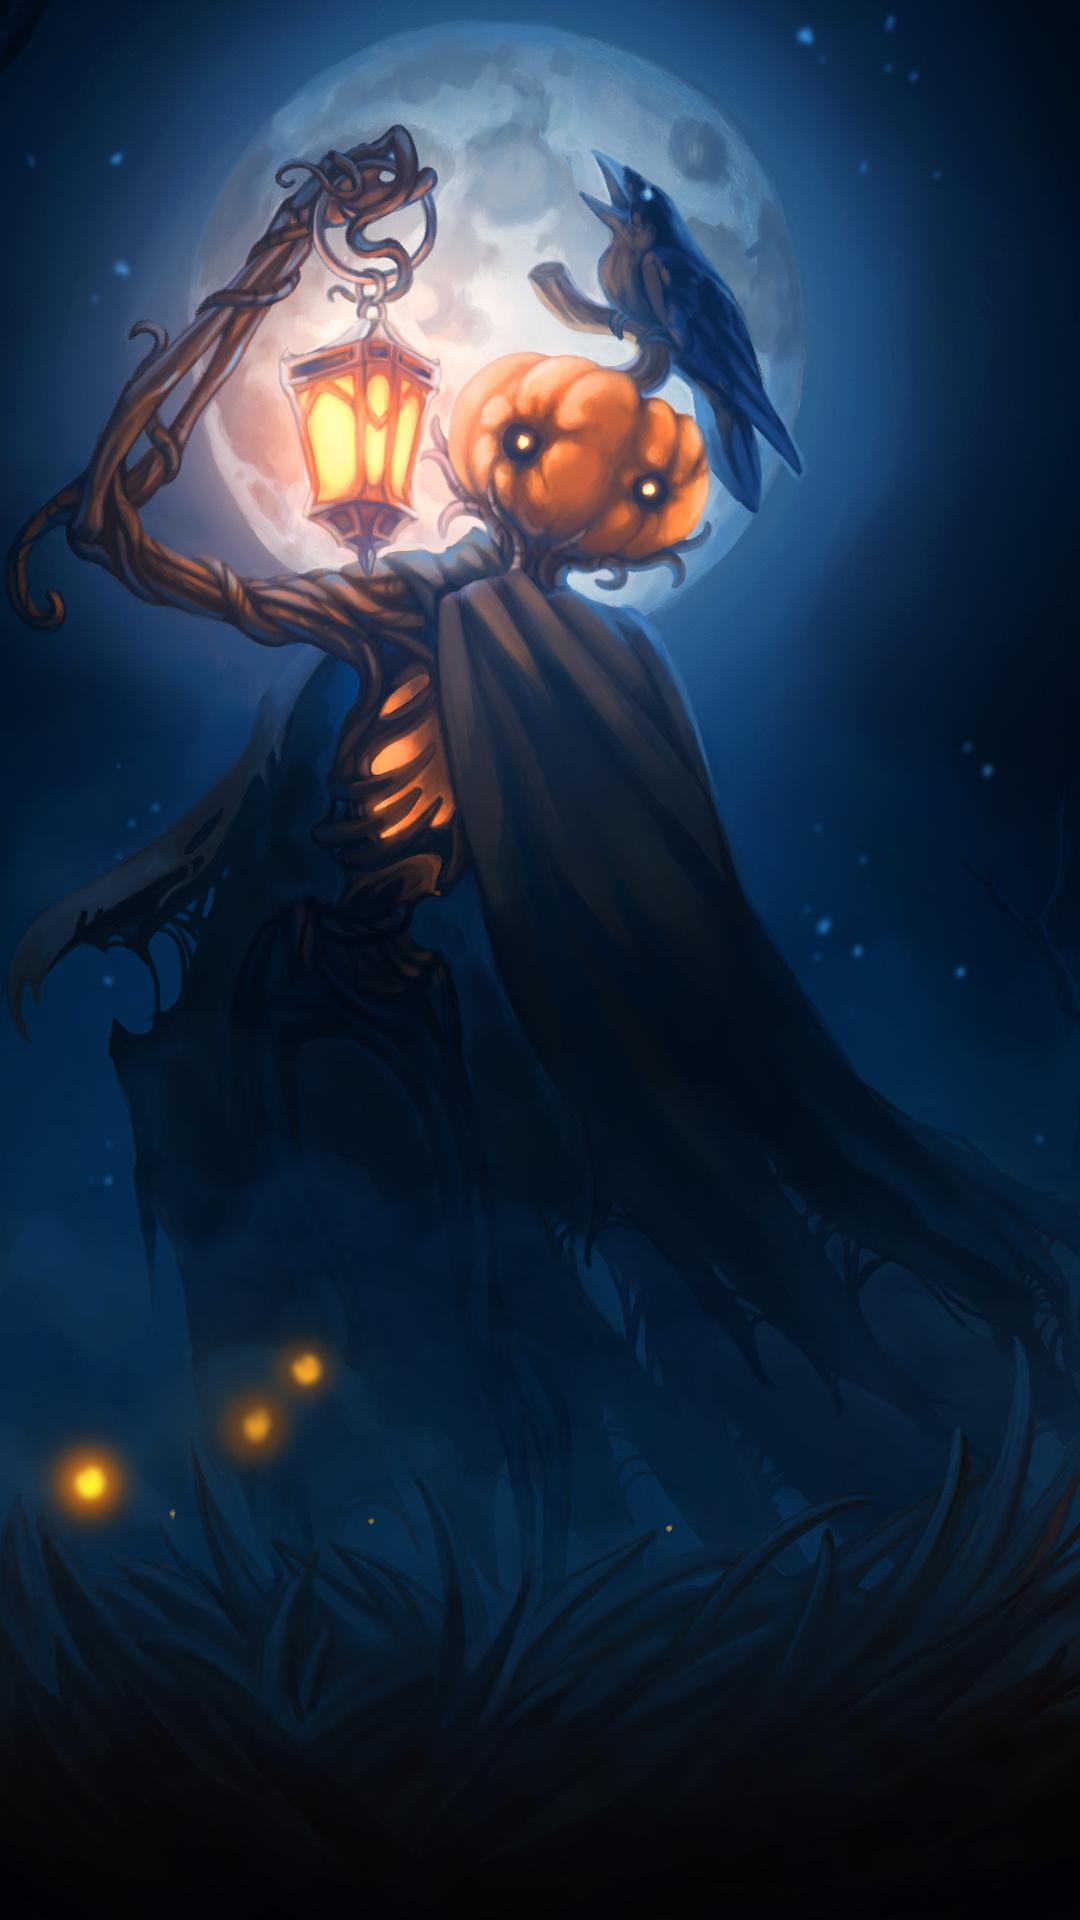 1080x1920 Halloween 2018 Digital Art 4k Iphone 7,6s,6 Plus ...